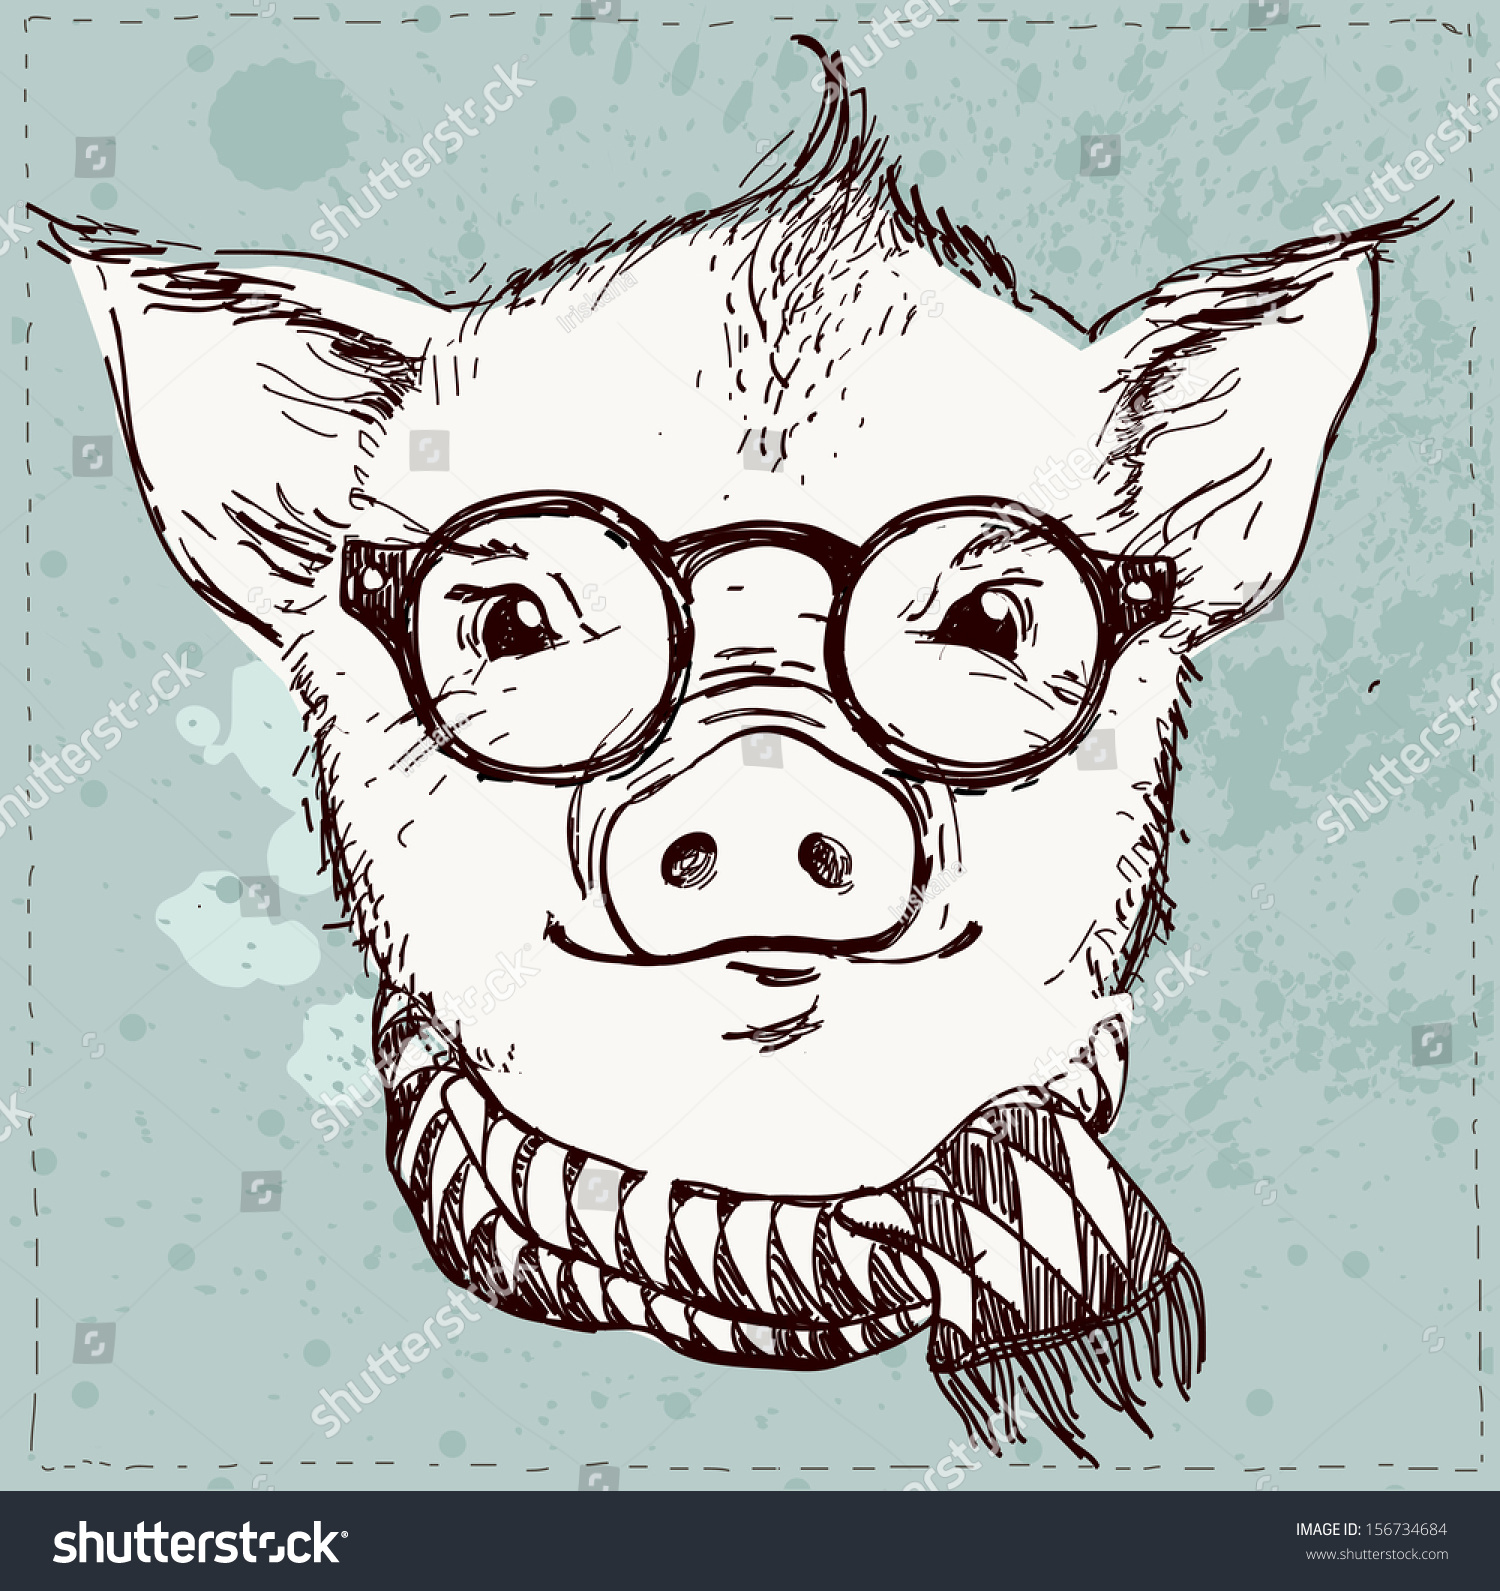 Vector Illustration Hipster Pig Glasses Scarf Stock Vector ...